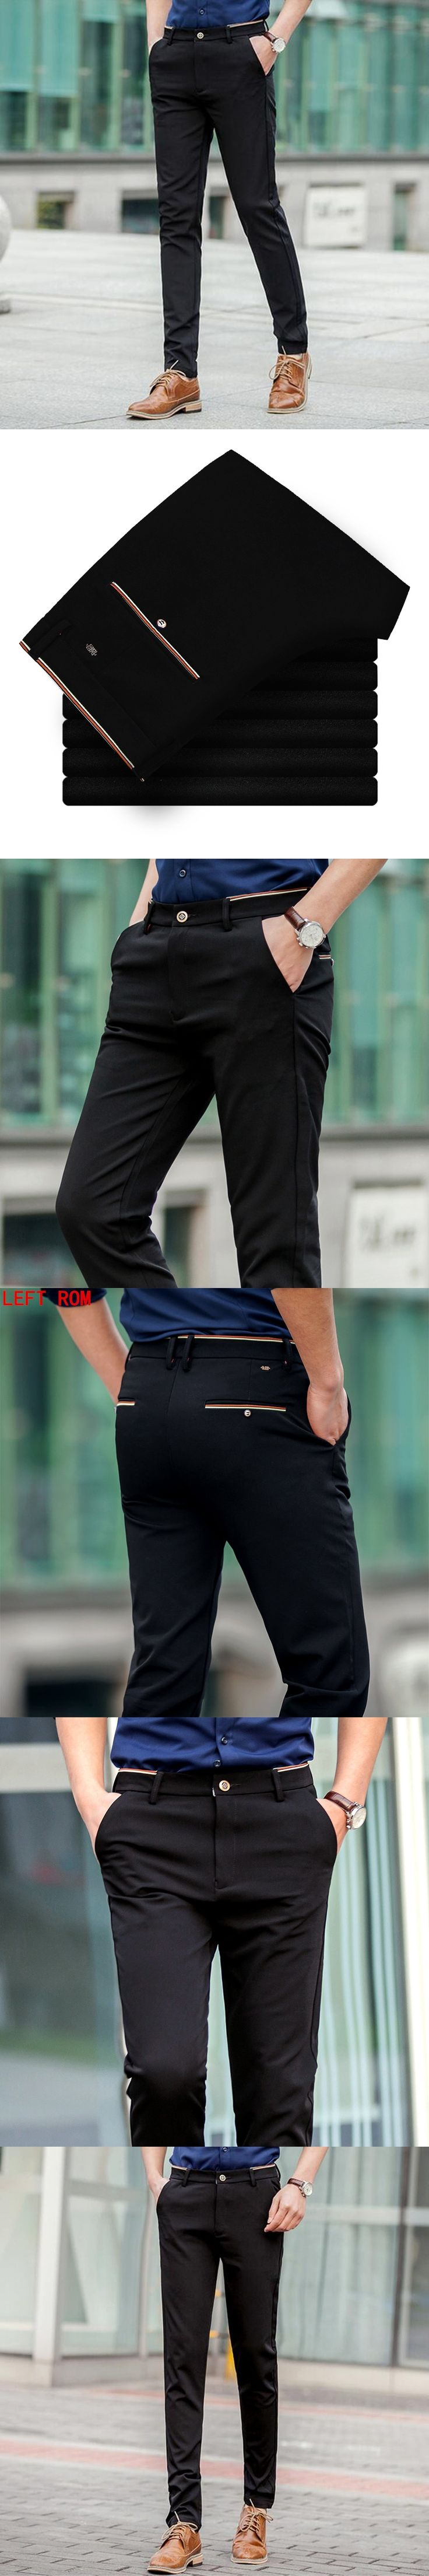 2017 Summer Business men Leisire pants trousers 28~34 black color Street beat Fashion tide male Casual pants Slim four stretch